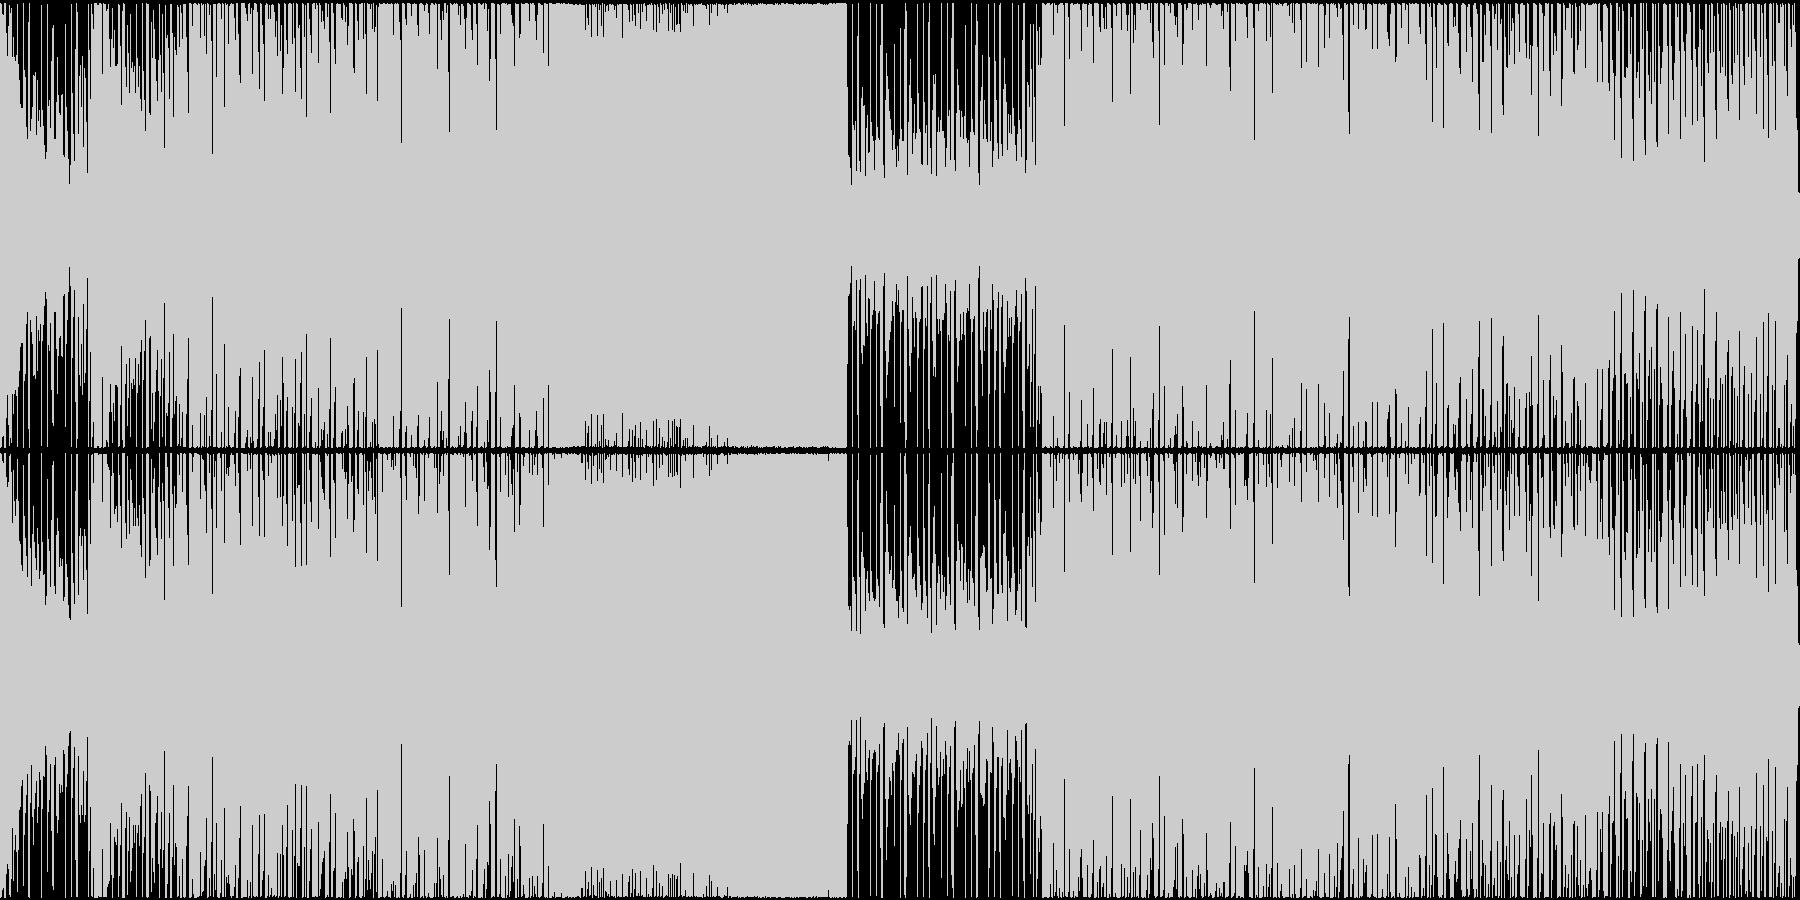 EDM スポーツ オープニング 走る Lの未再生の波形